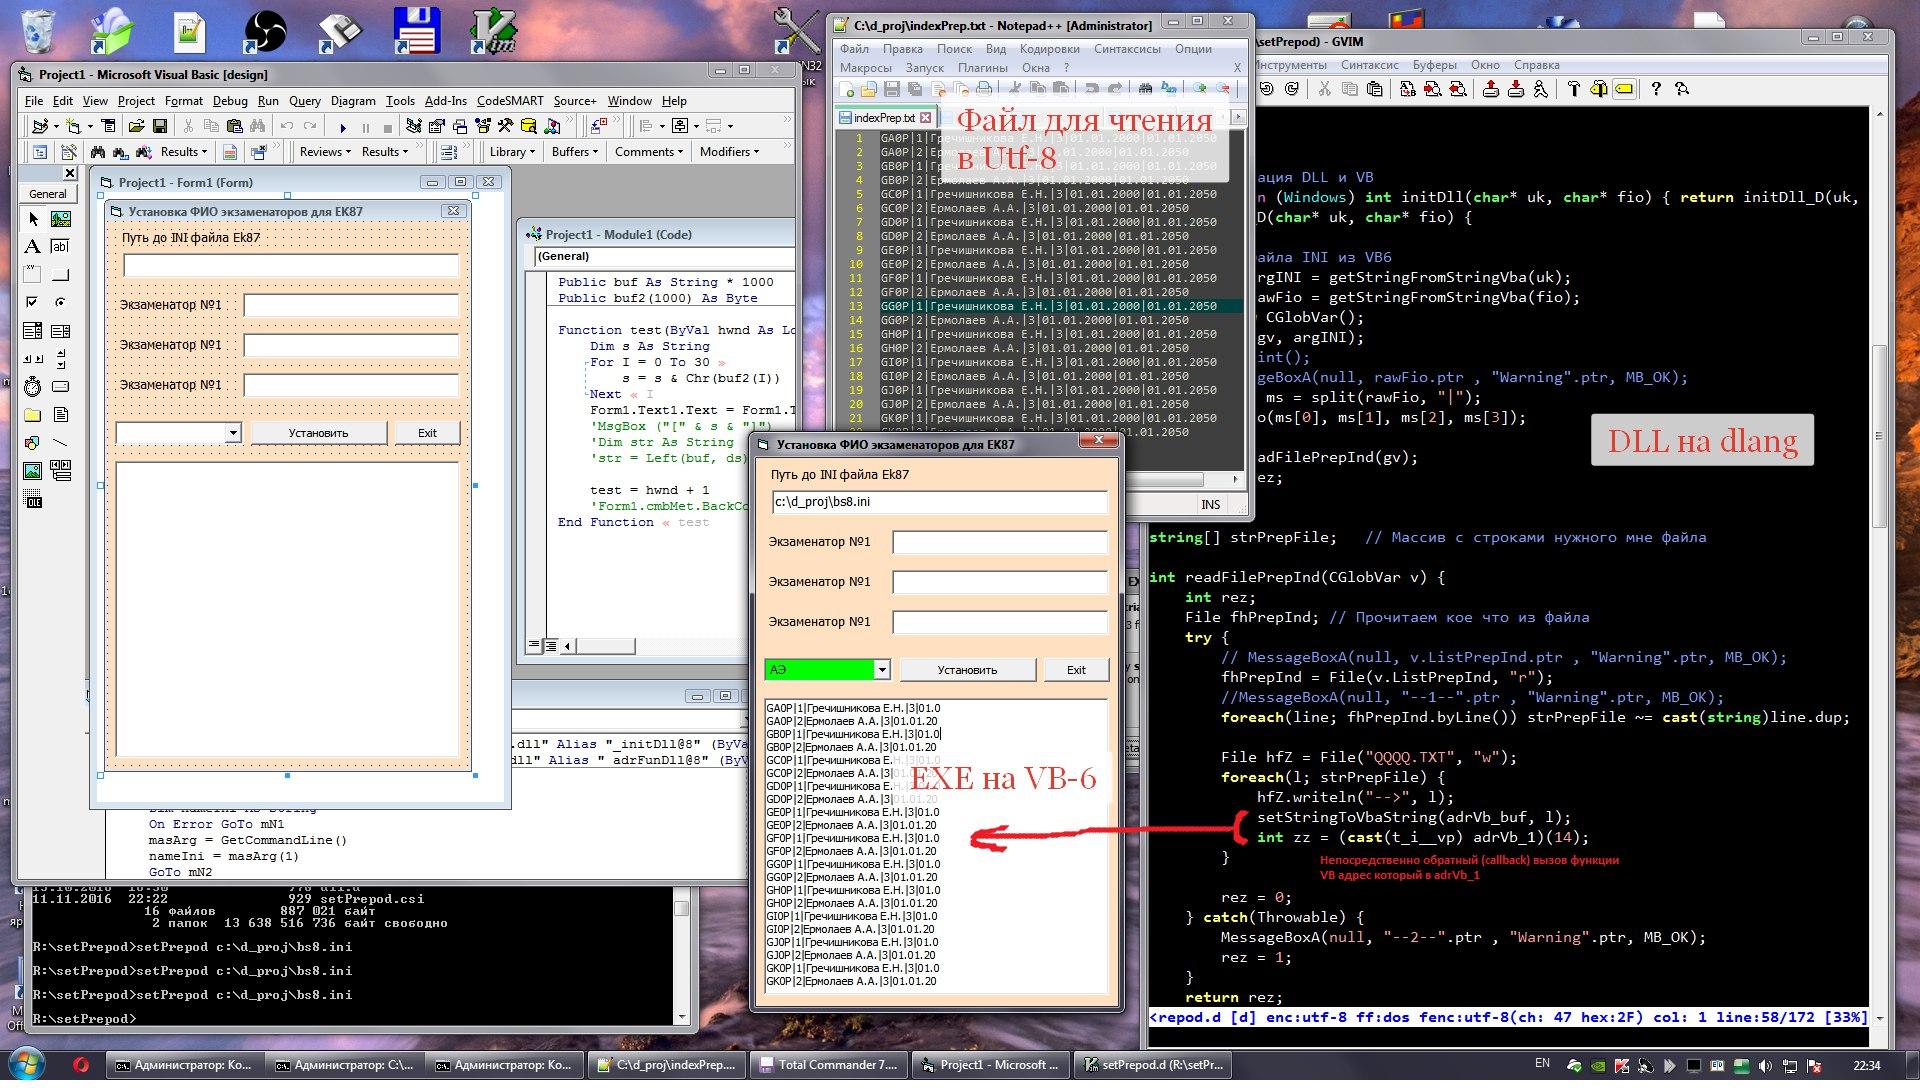 digitalmars D announce - JavaScript ( QScript Qt-5 ) in GUI